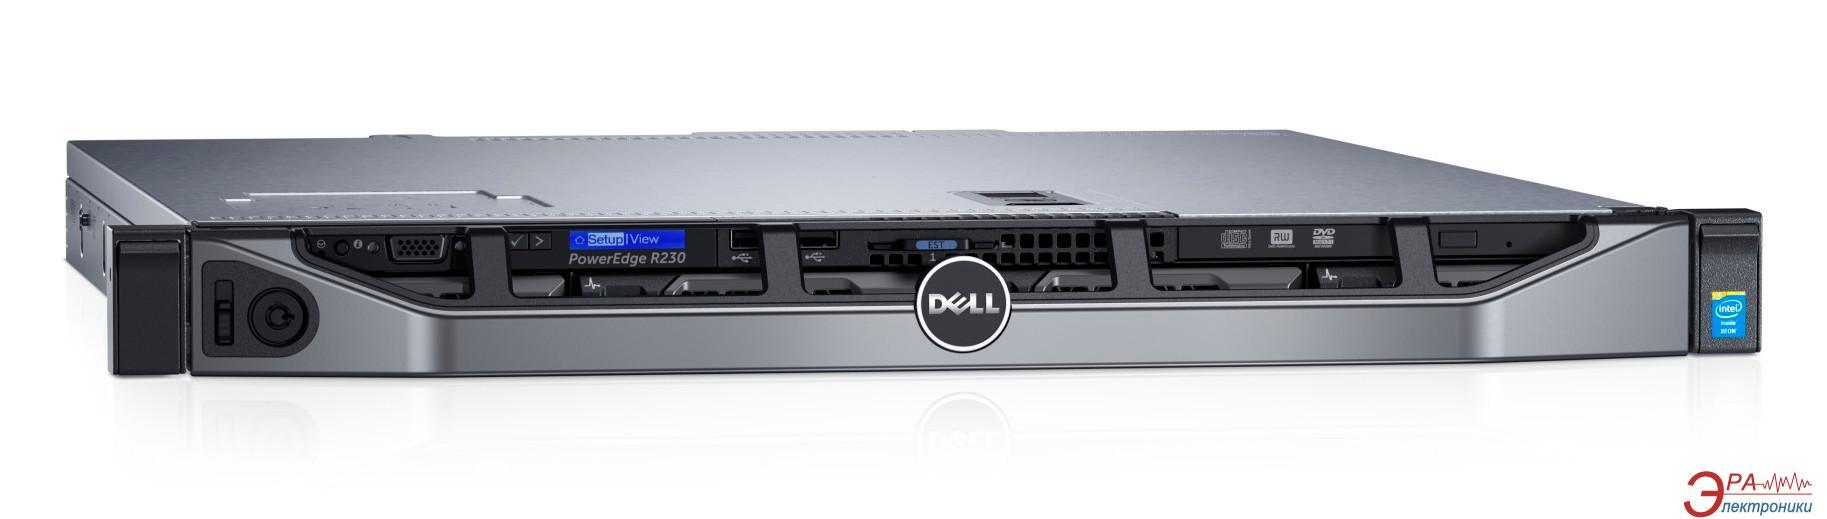 Сервер DELL R230 (210-AEXB-LFF)